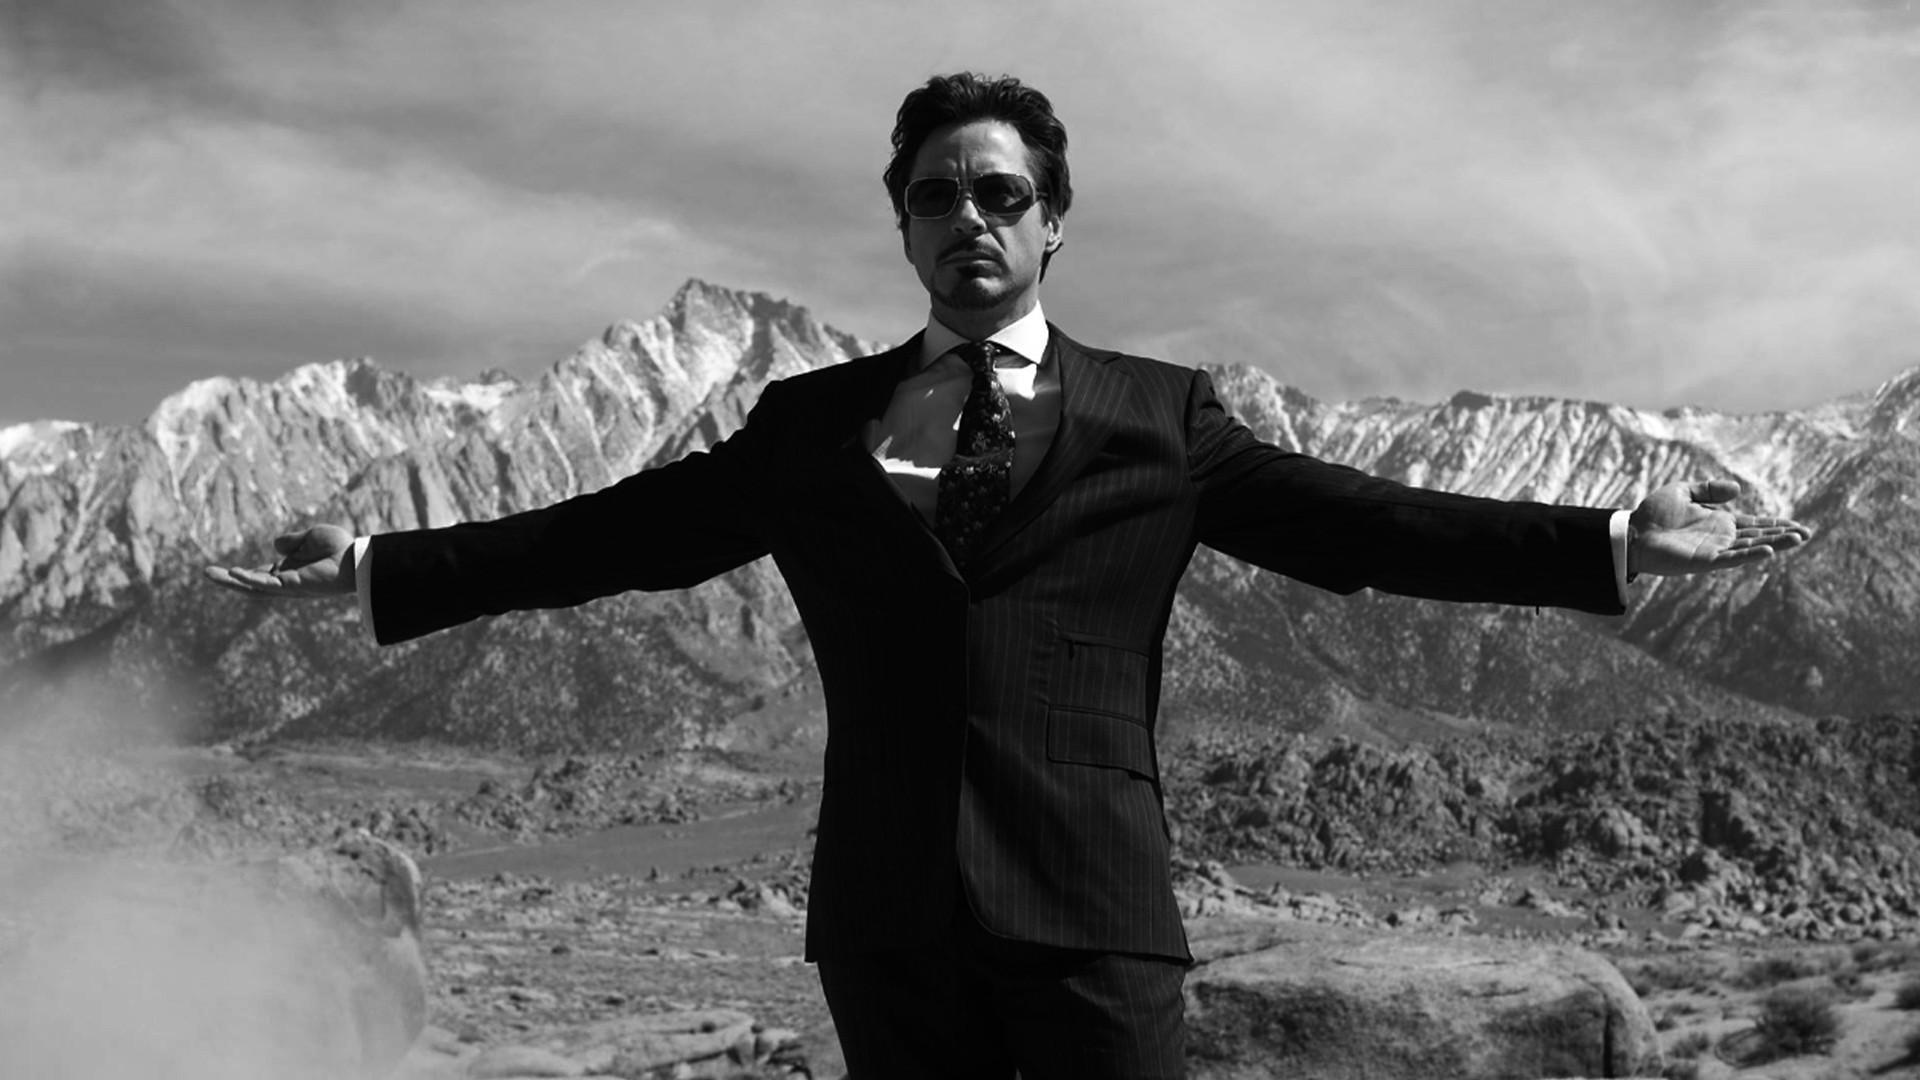 Tony Stark 4k Wallpaper: Robert Downey Jr Iron Man Wallpaper